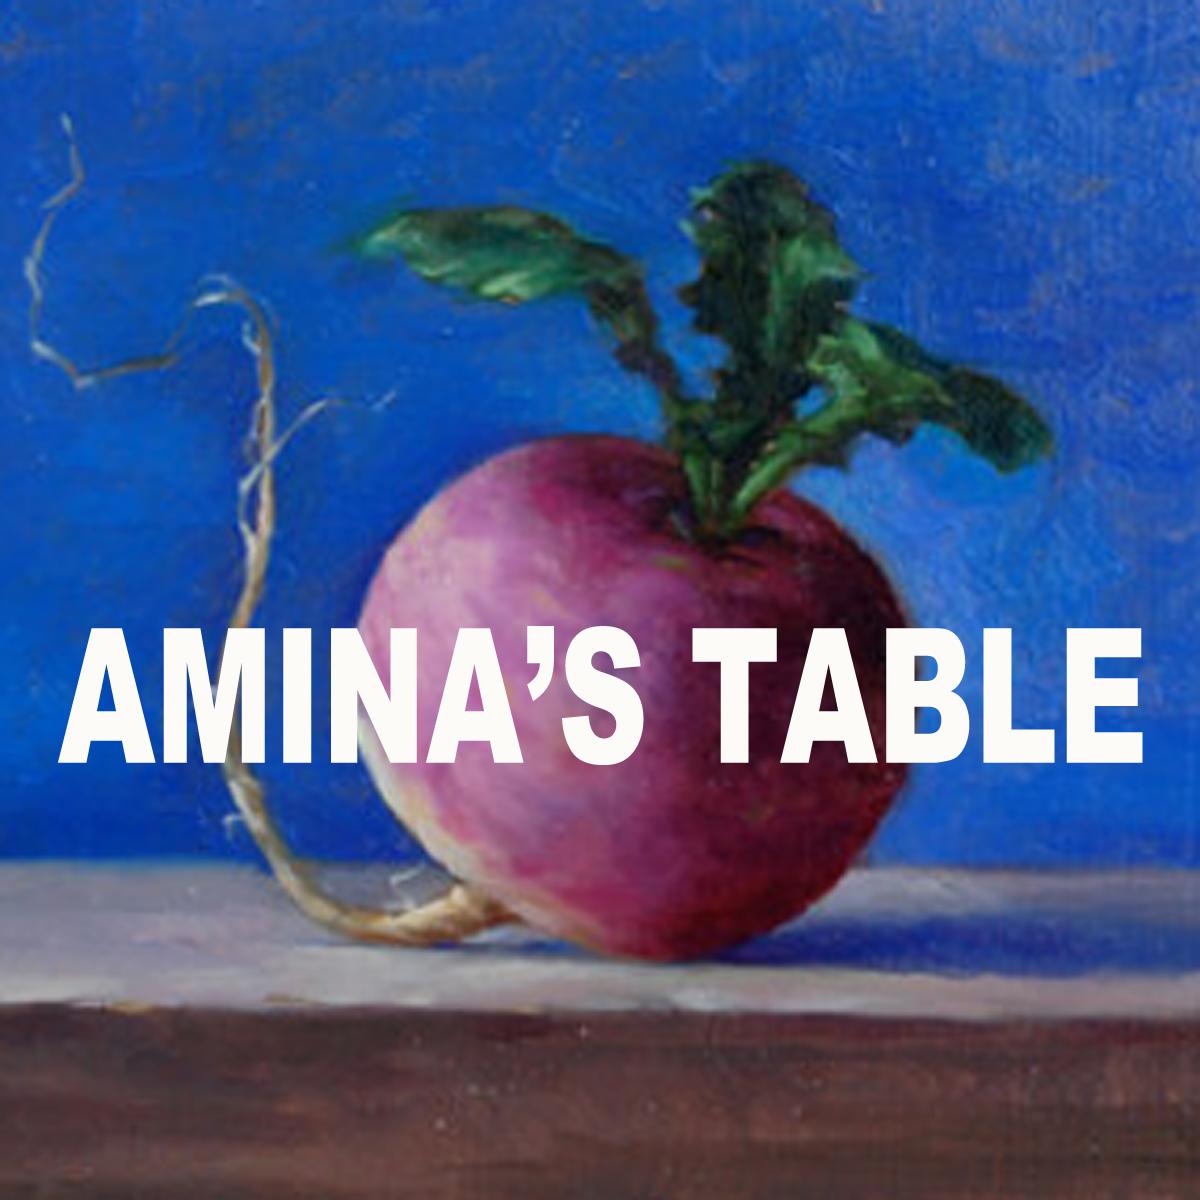 AMINAS TABLE.jpg